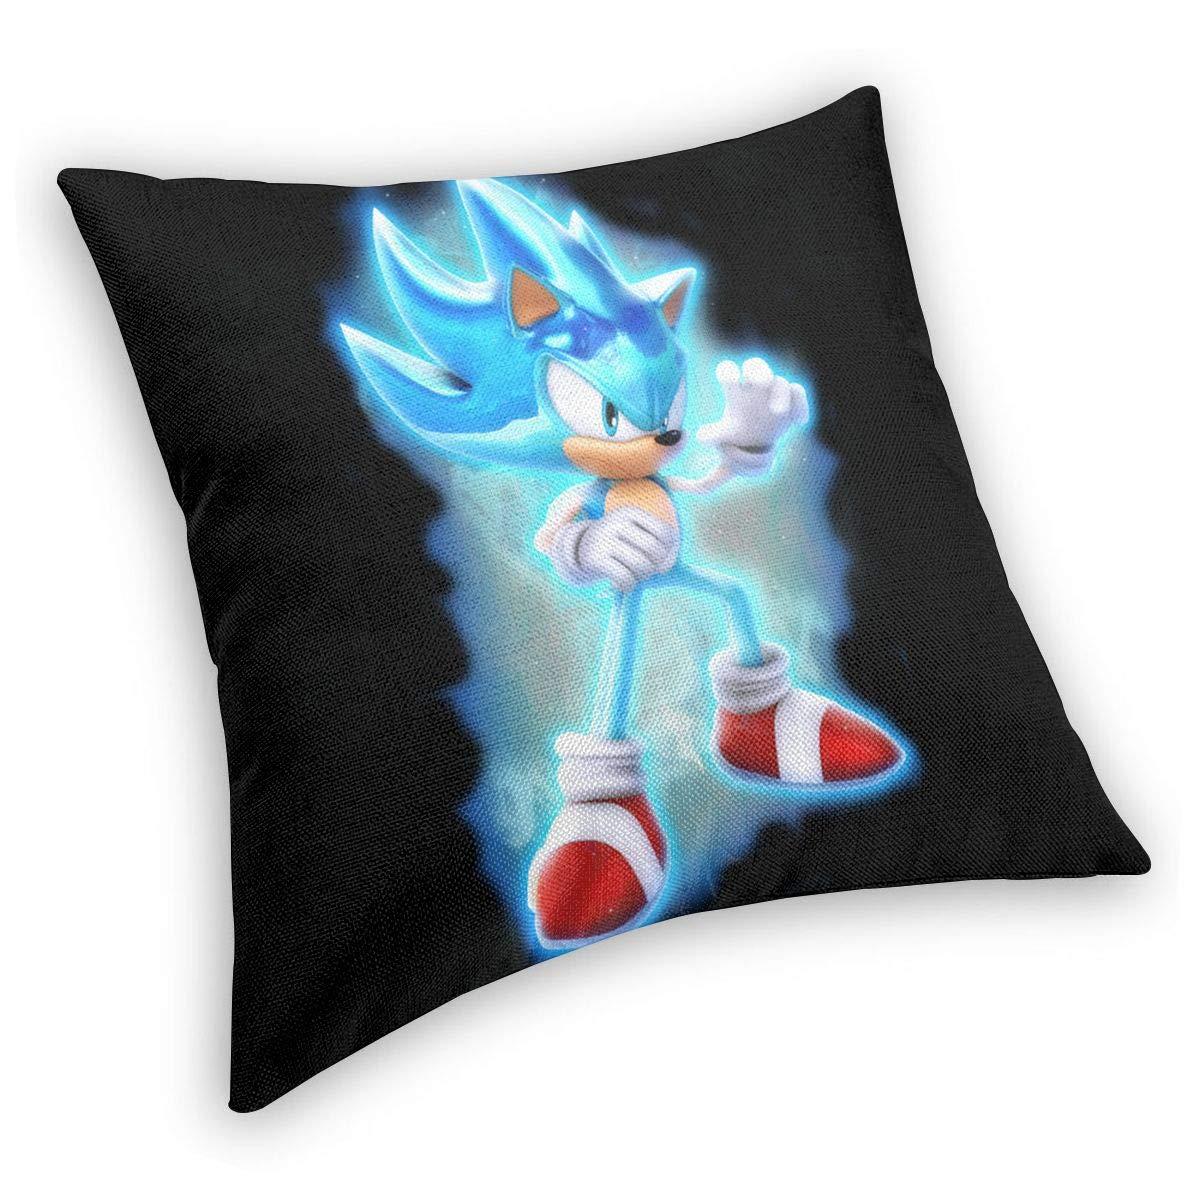 Super Soft Velvet Throw Pillowcases Stain Resistant Modern Zippered Cushion Covers for Winter Bedding Sofa 18x18 Inch Super Blaze The Cat Burning Render Fan Art